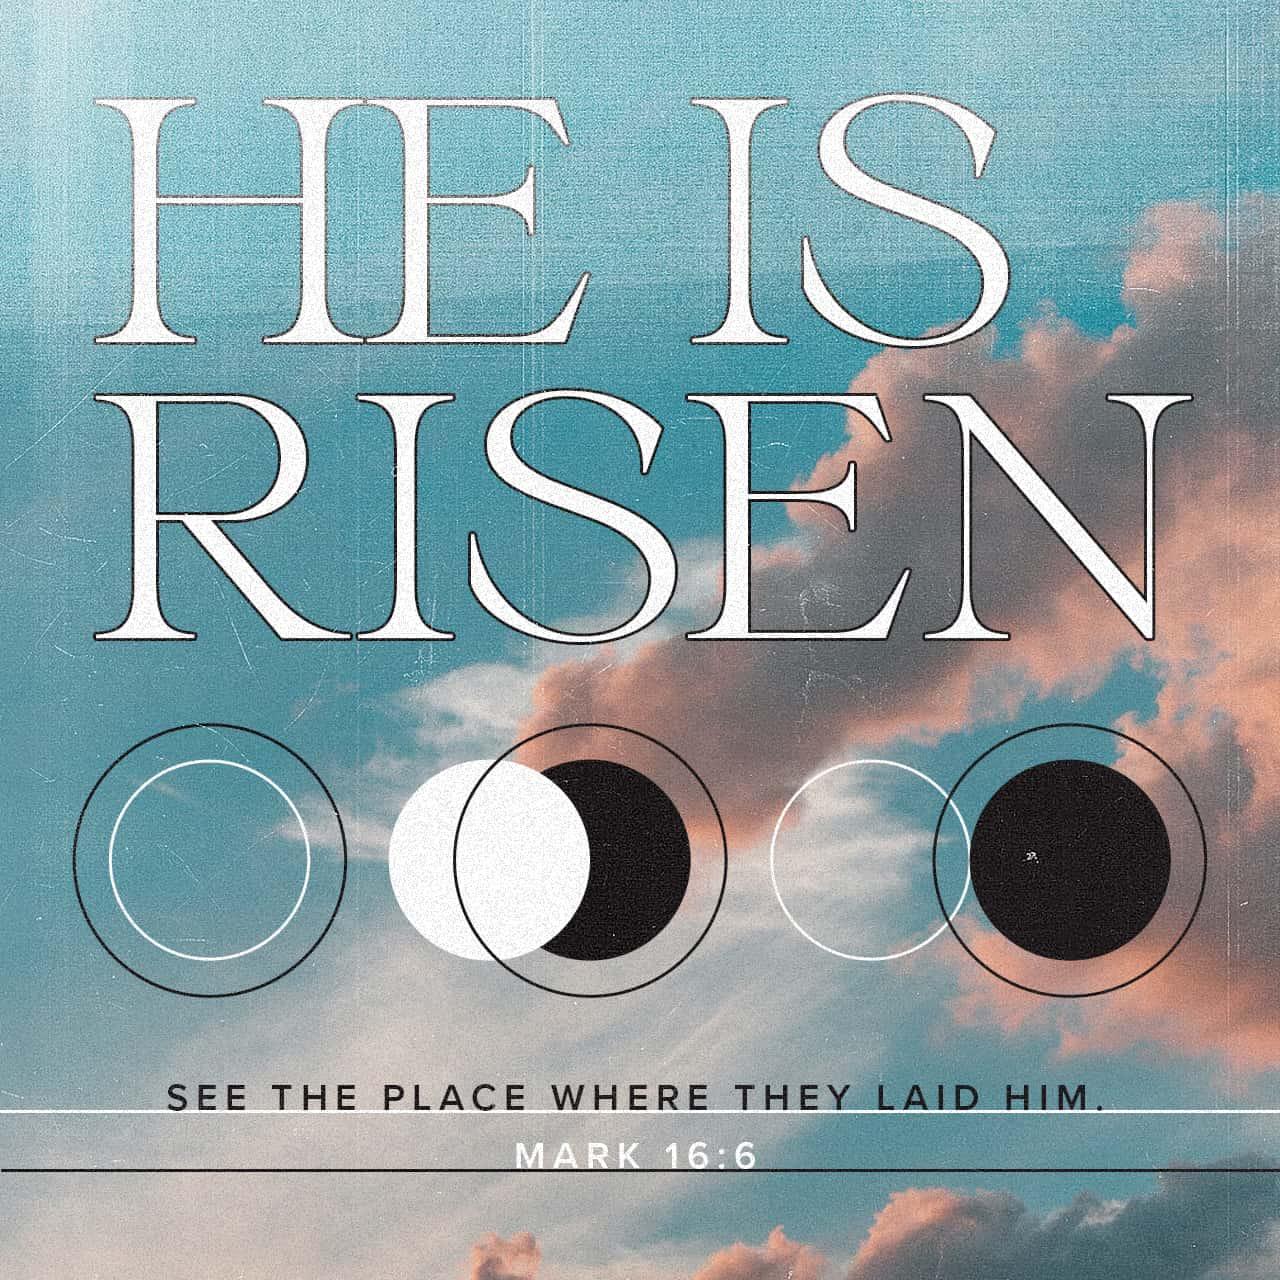 Mark 16:6 Verse Image